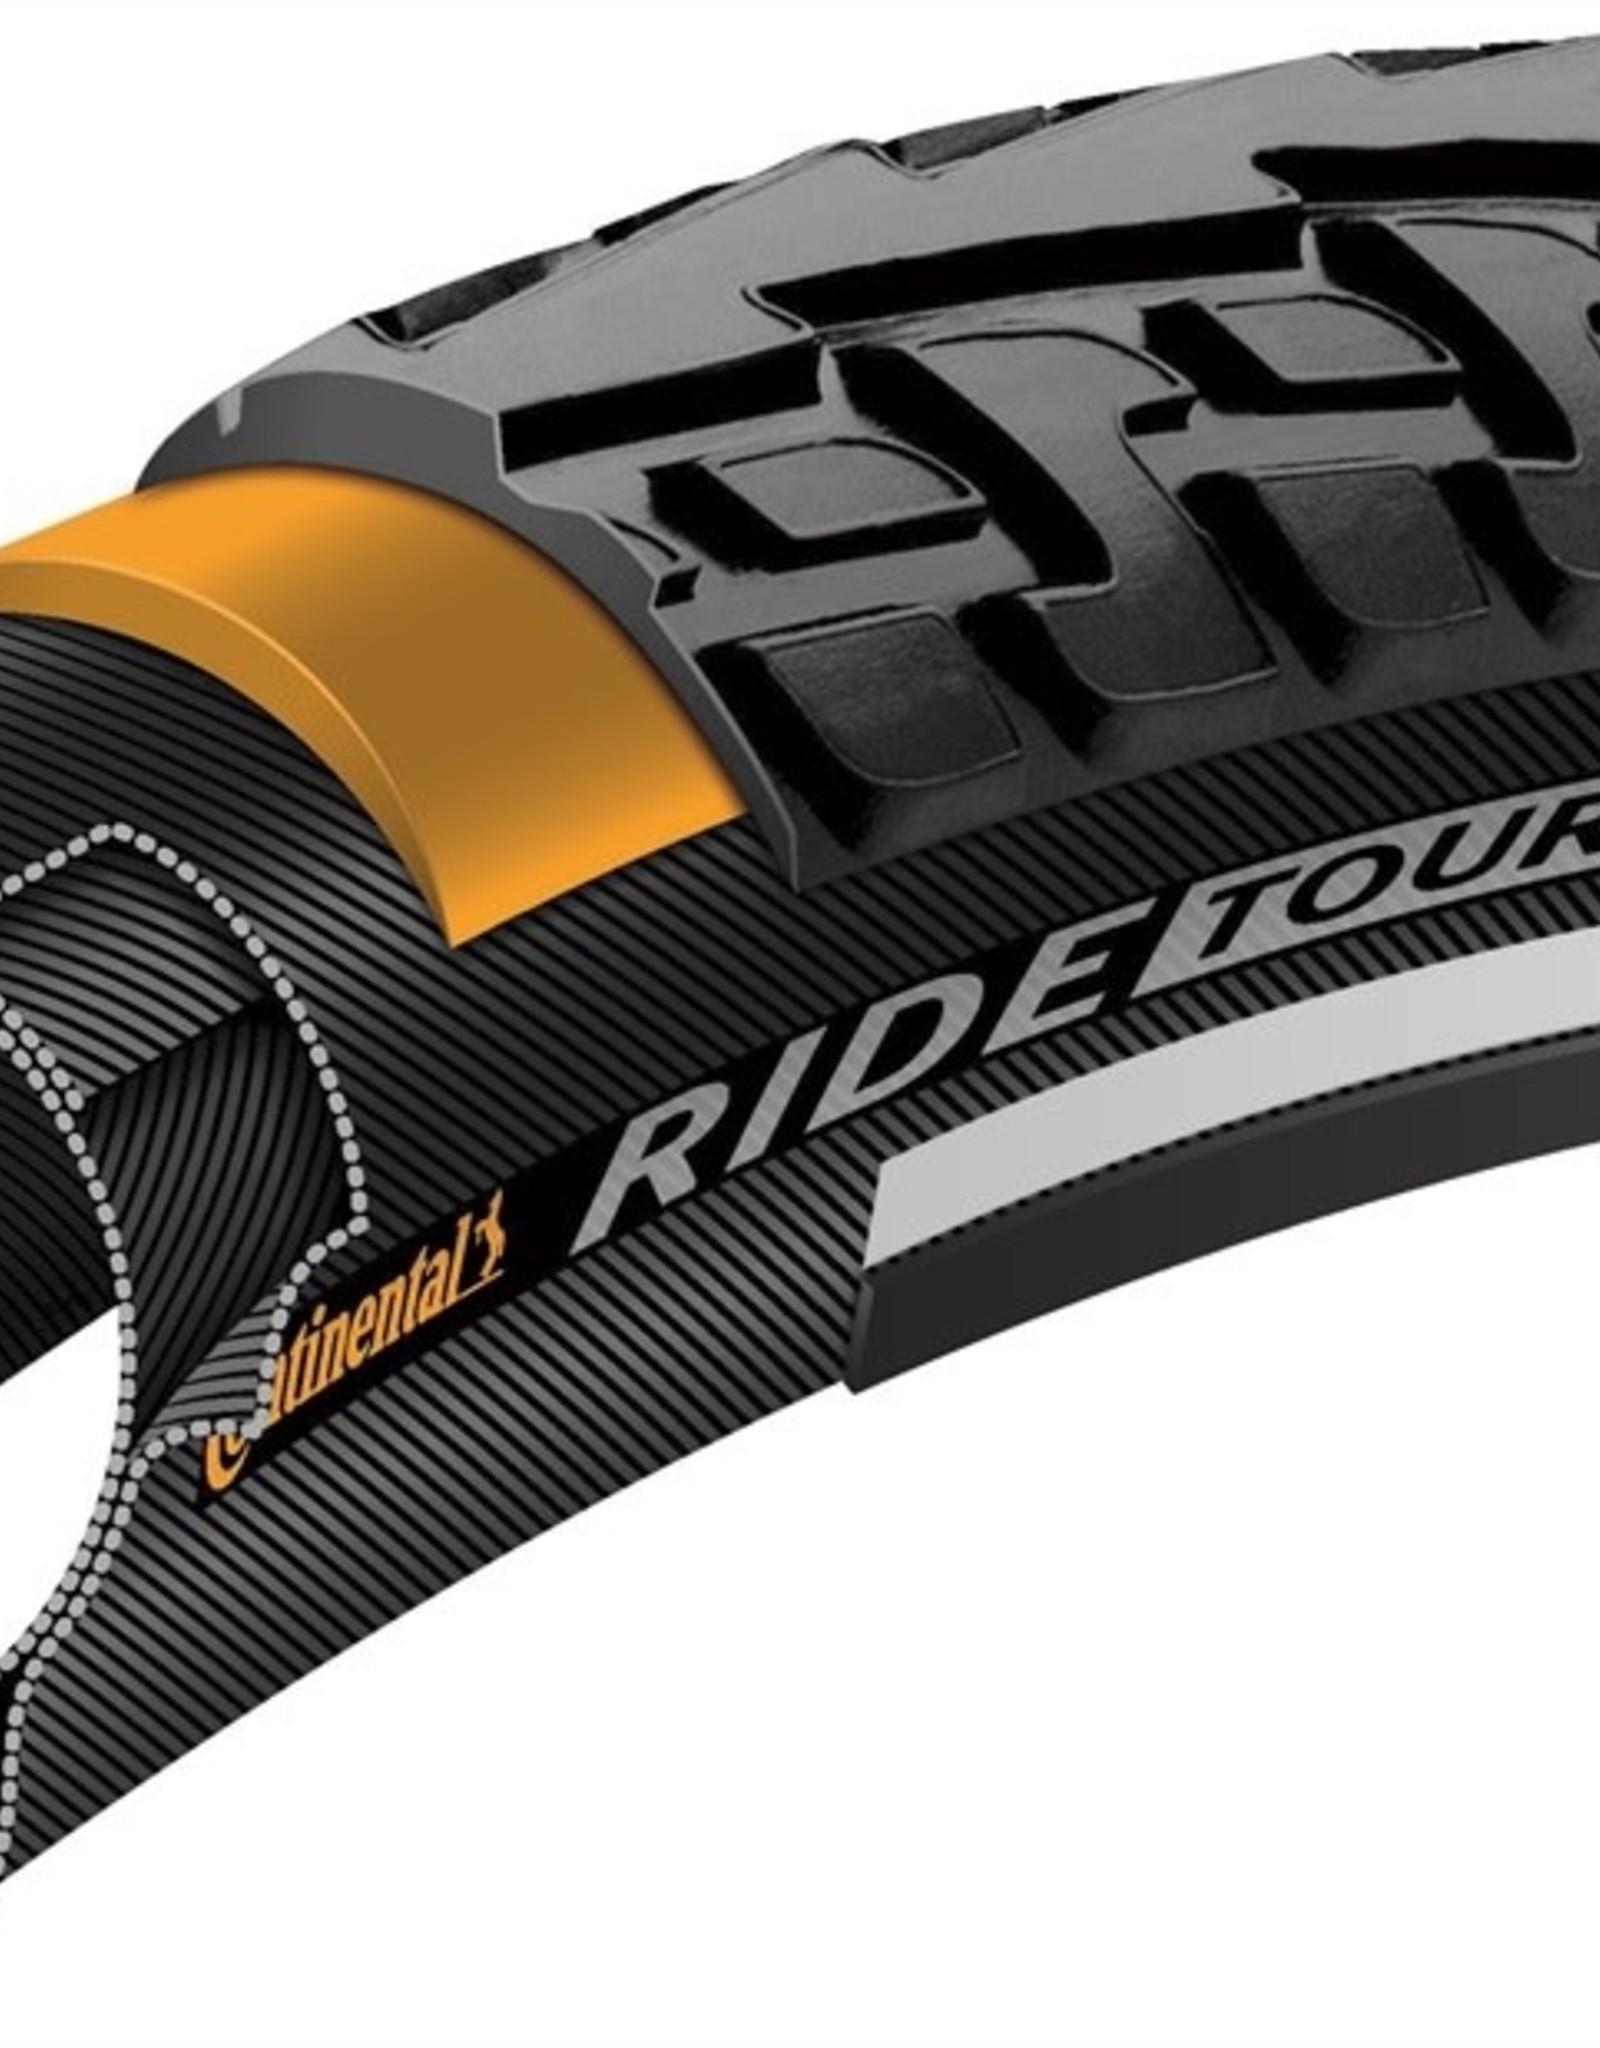 CONTINENTAL CONTINENTAL Tire RIDE TOUR 700 x 28c